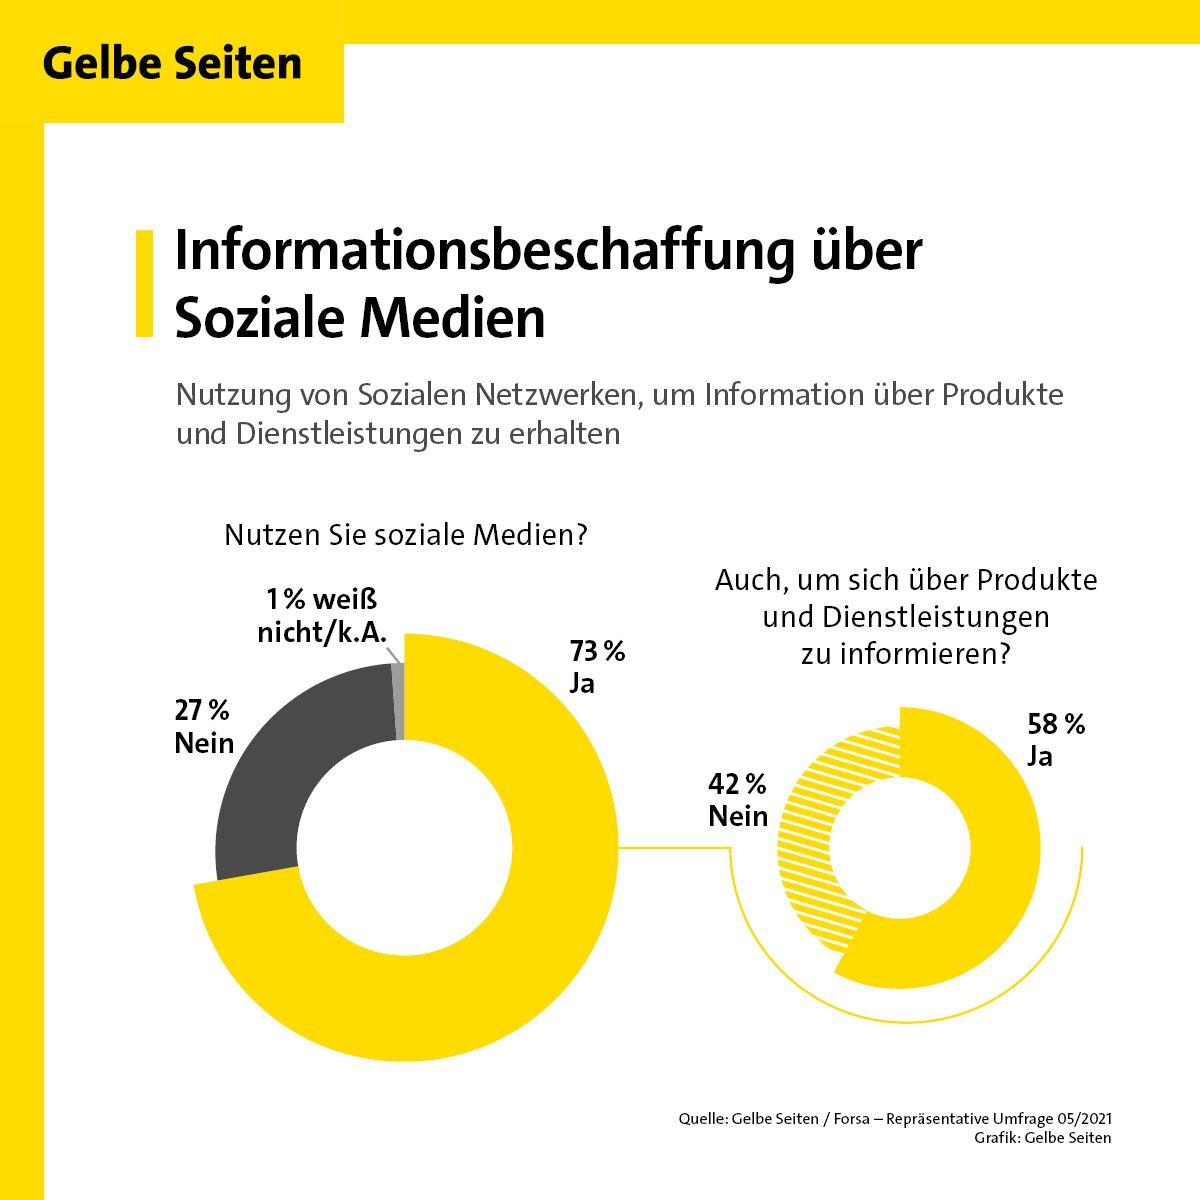 Gelbe Seiten Informationsbeschaffung über Social Media